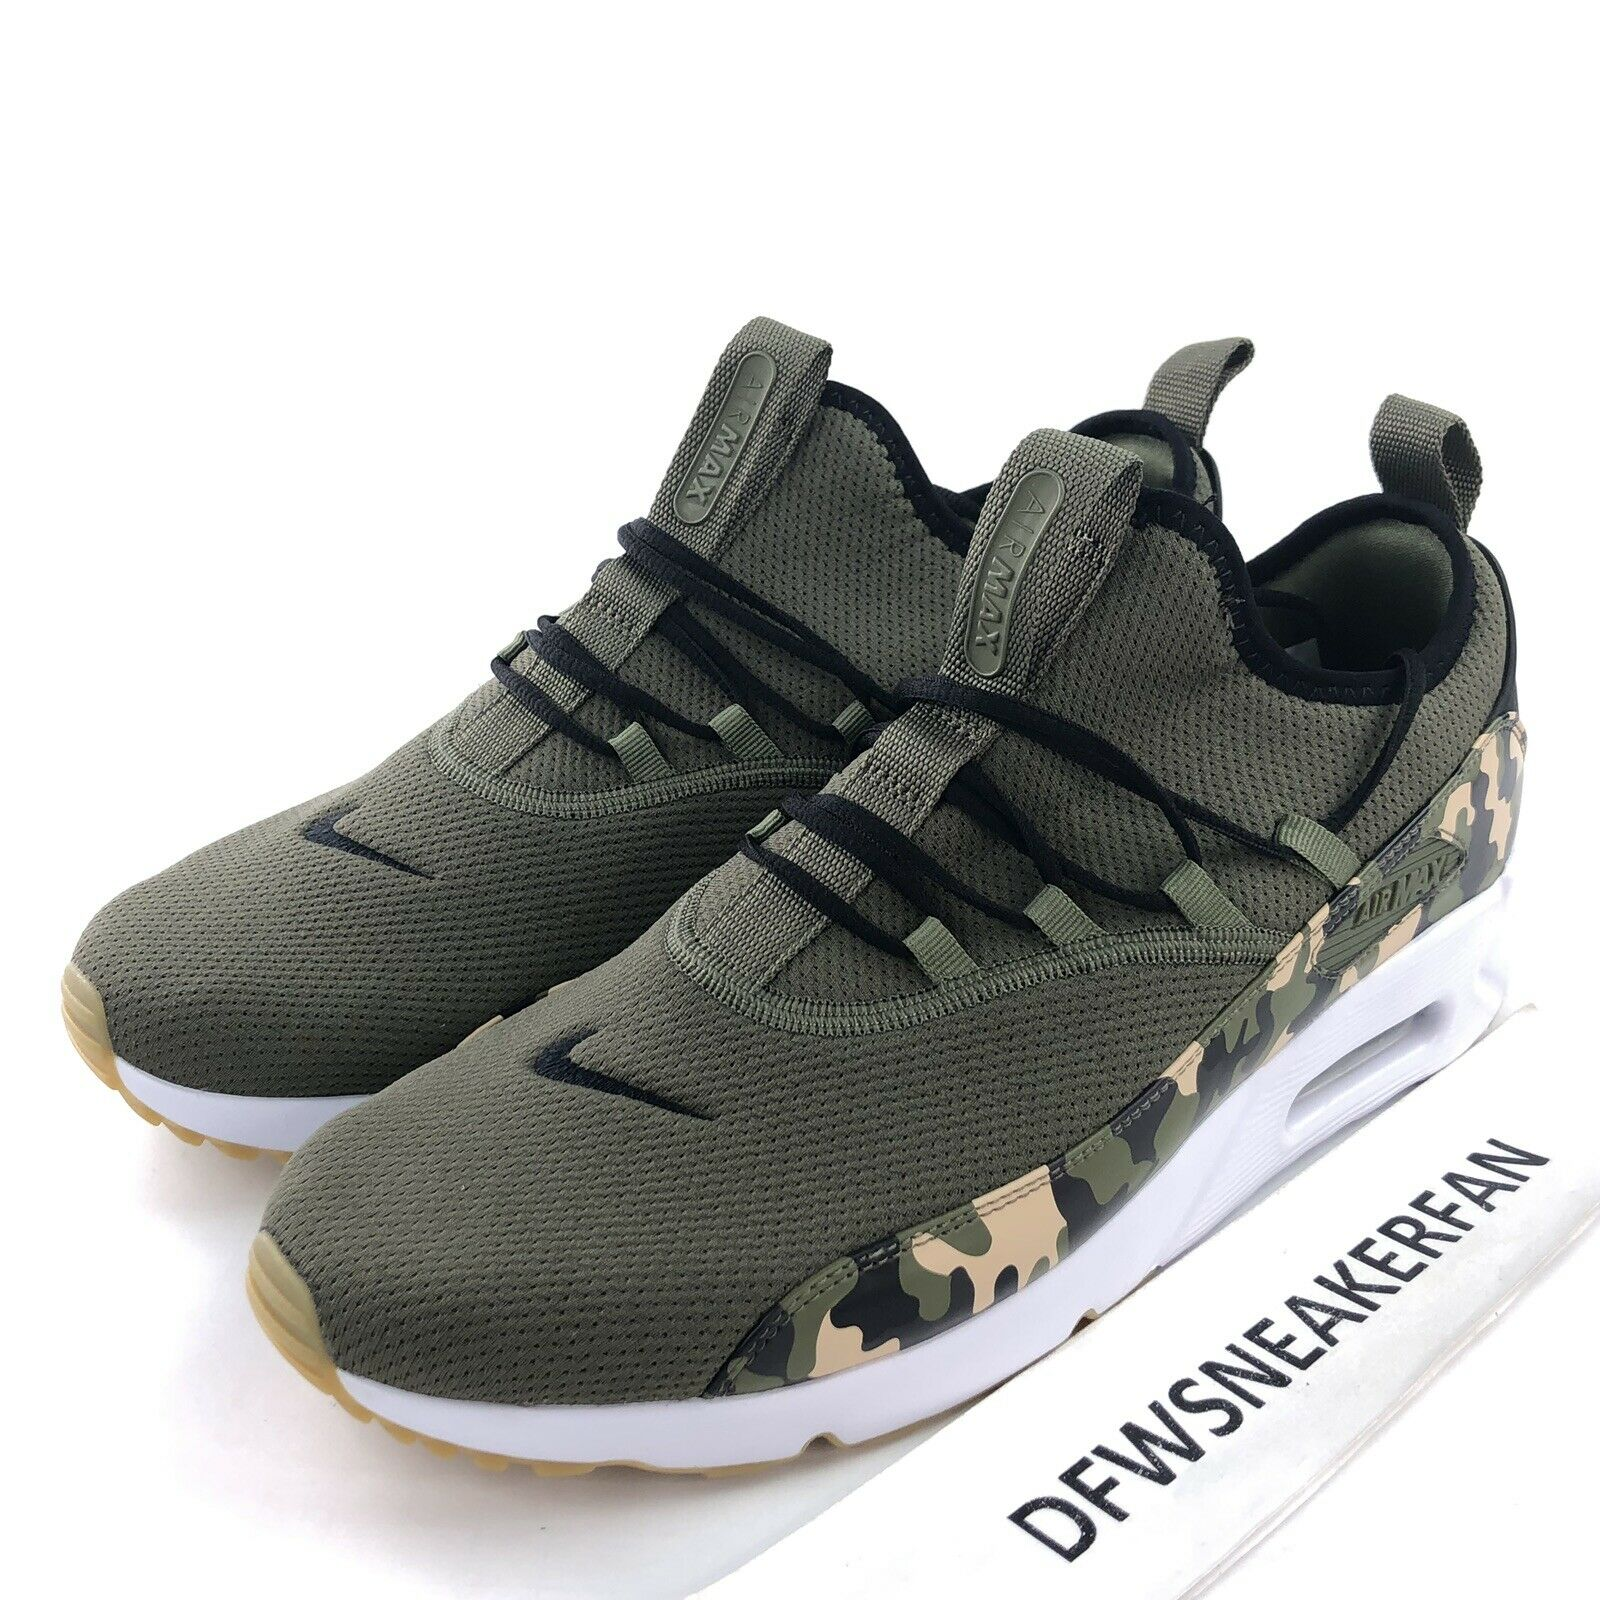 5264fe5fac Nike Air Max 90 EZ Men's 10 Camo-Medium Olive Running shoes AO1745-201